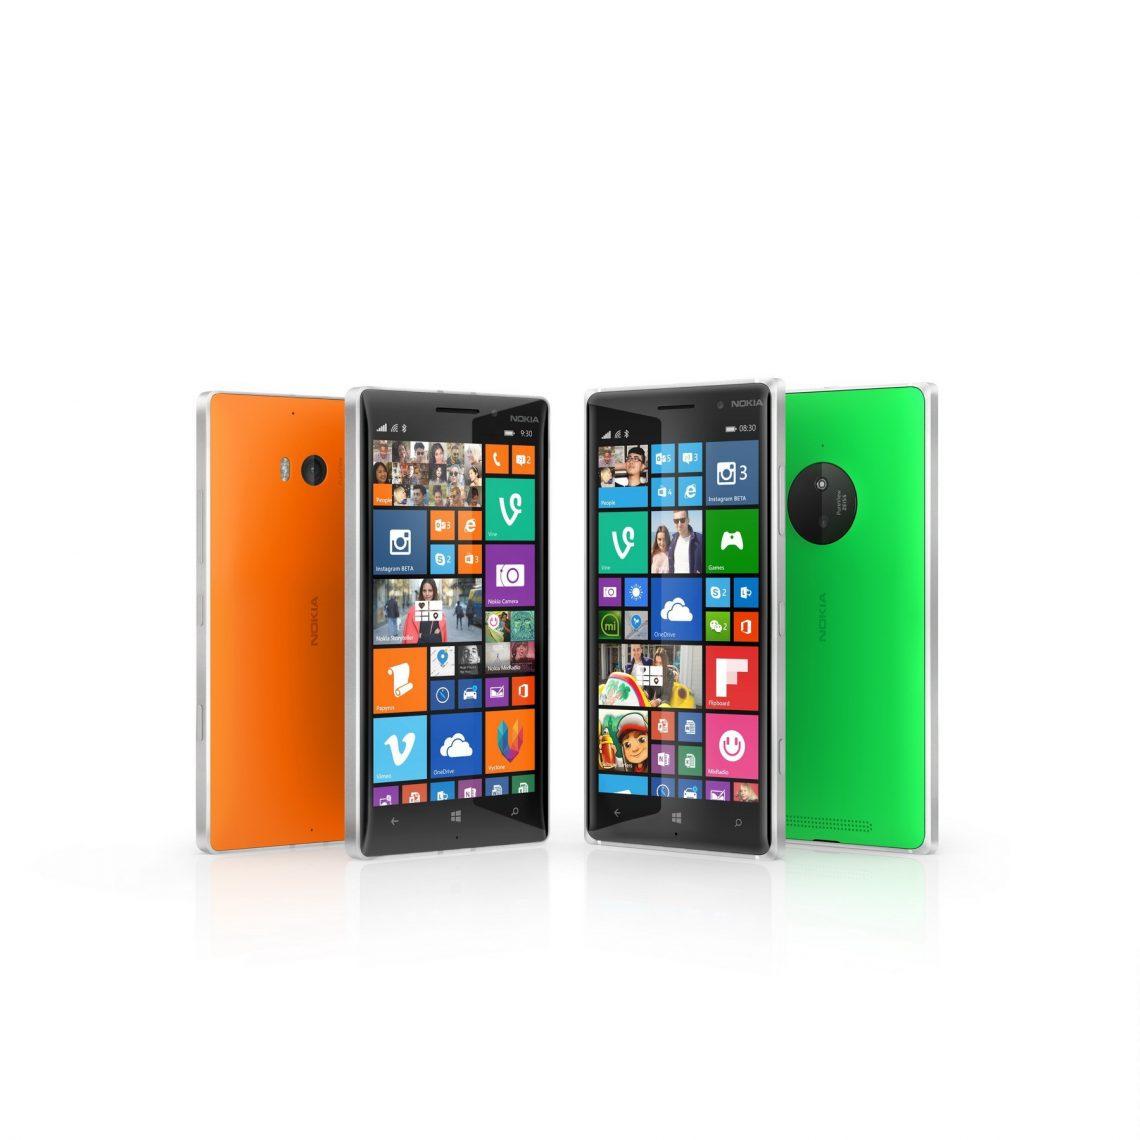 [PR] ไมโครซอฟท์วางจำหน่าย Nokia Lumia 830 และ Lumia 730